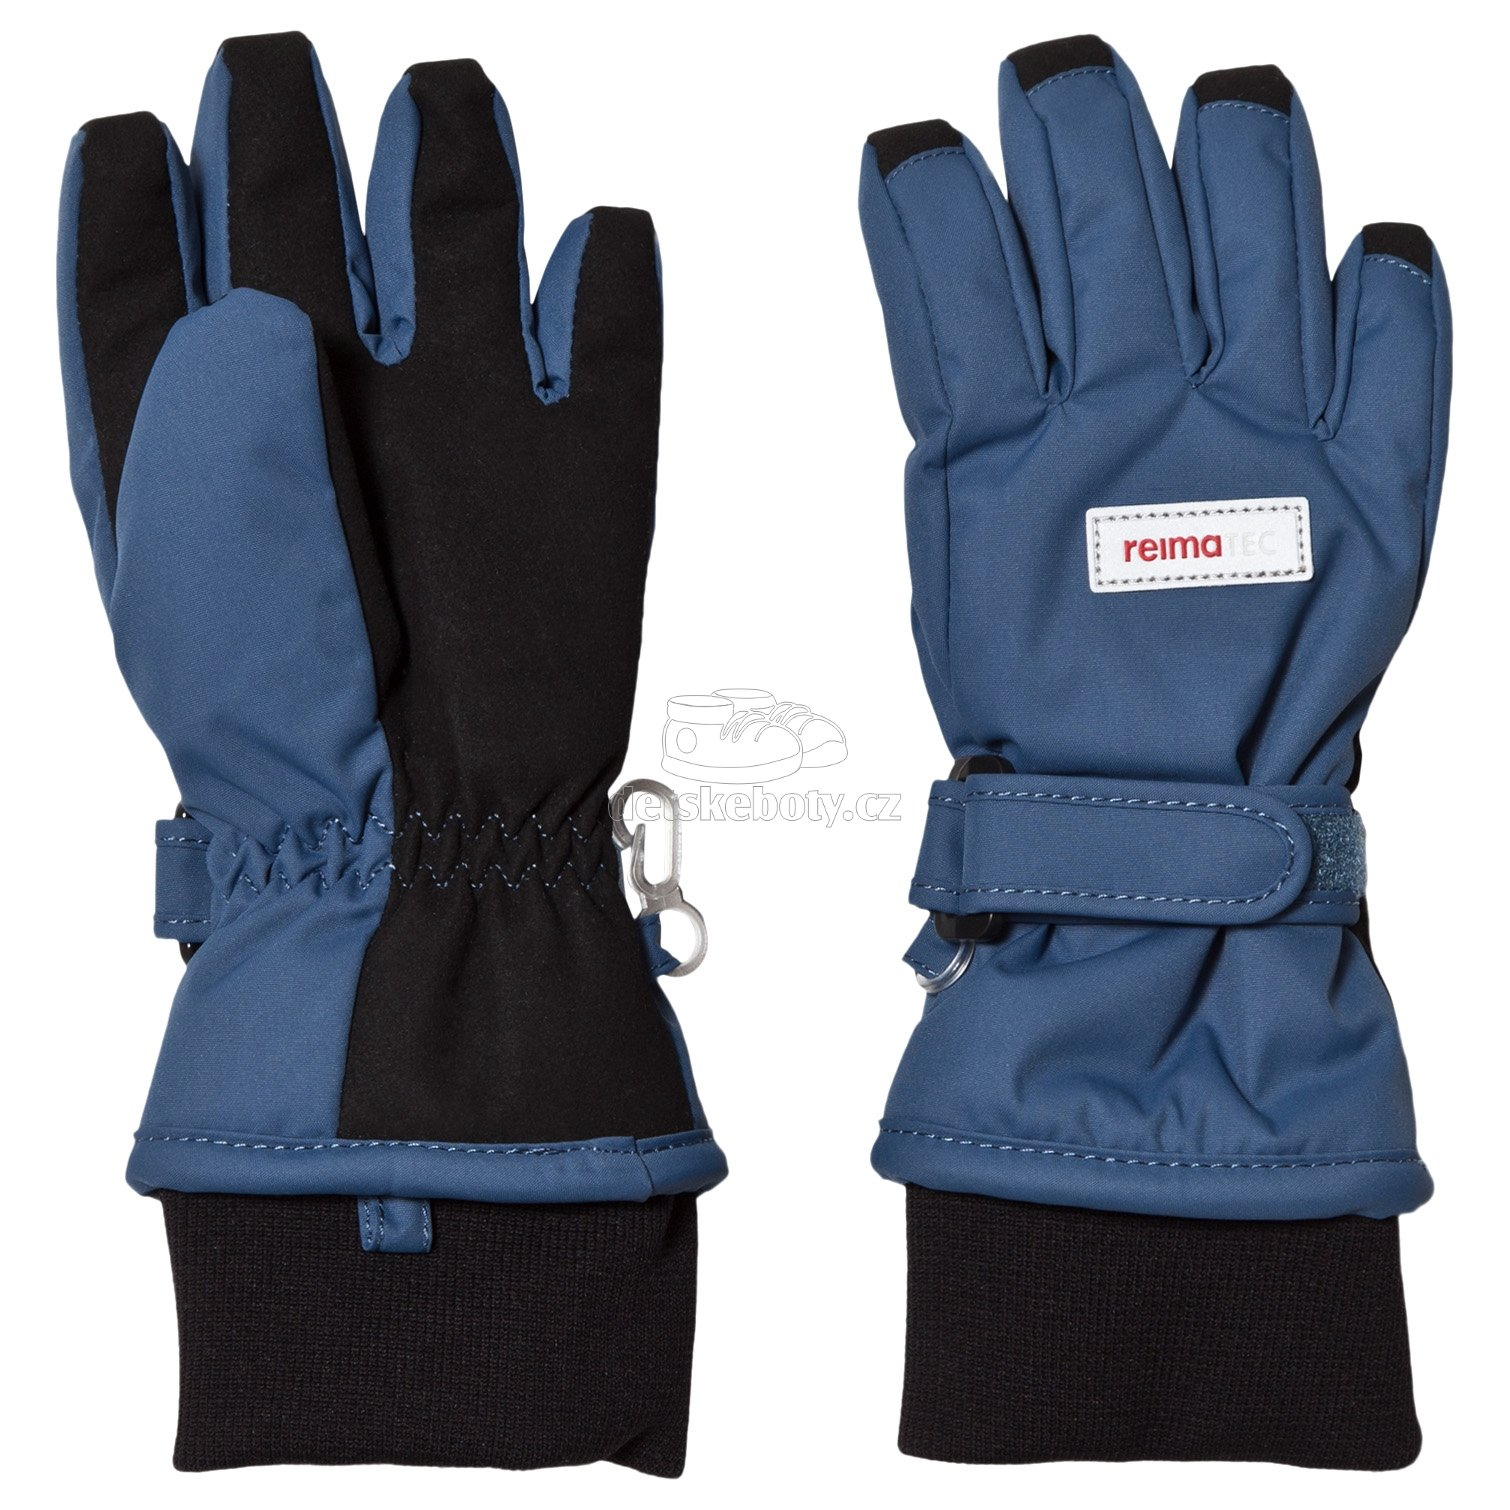 Dětské rukavice Reima 527289 Tartu denim blue